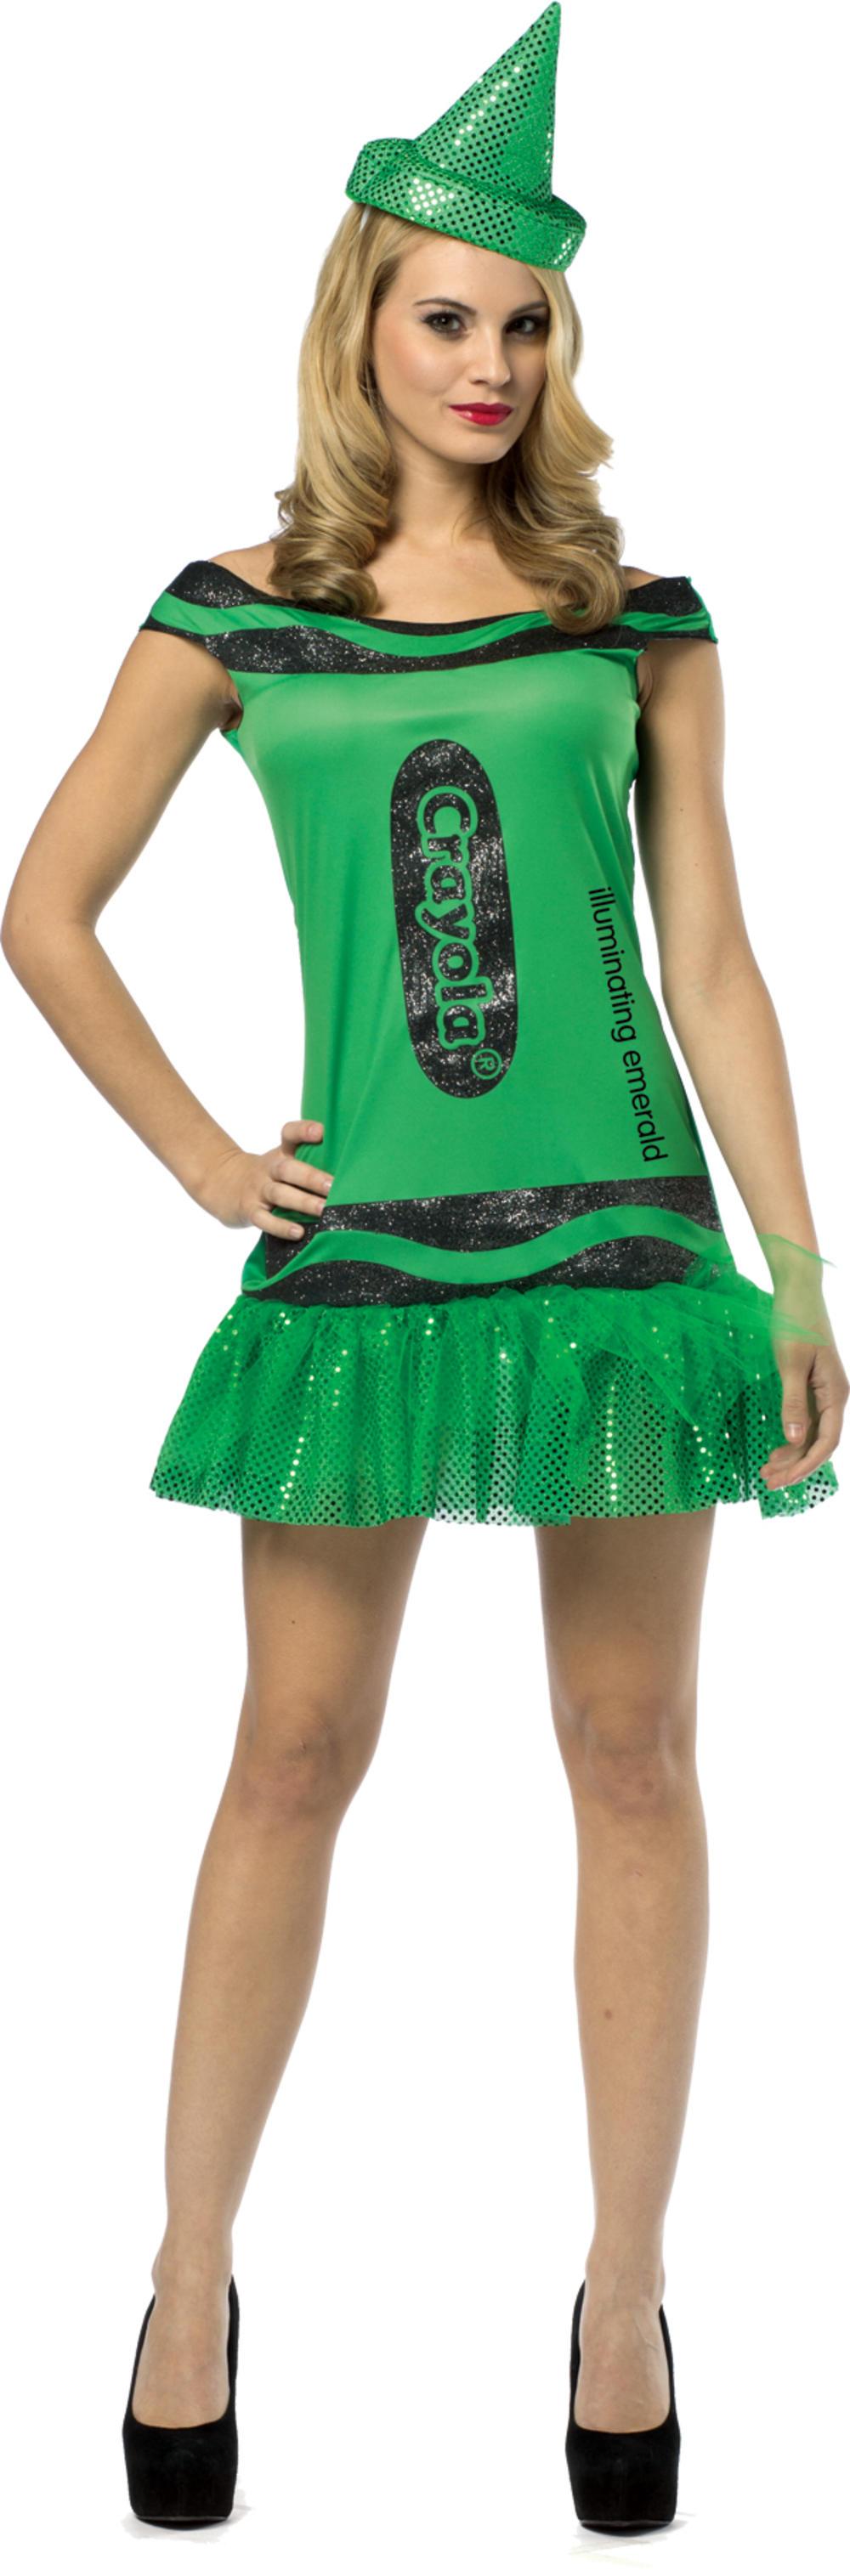 Emerald Green Crayola Glitter Dress Women's Costume